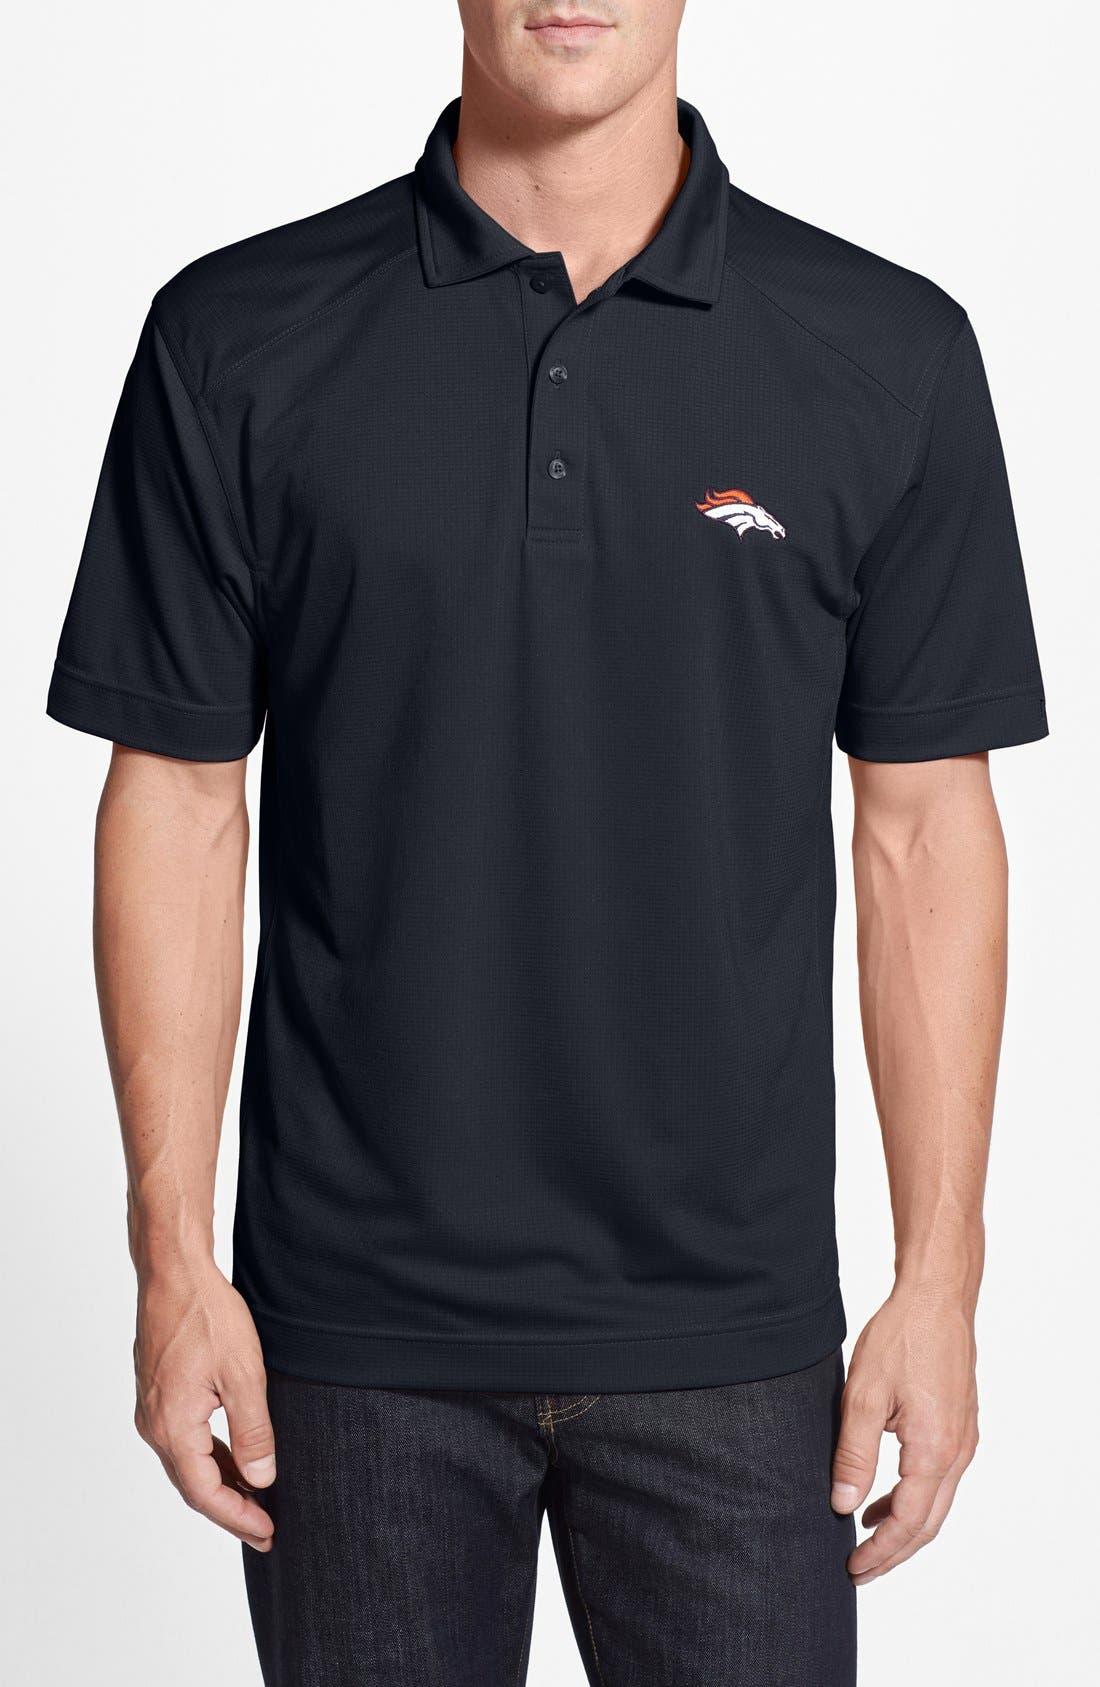 Cutter & Buck Denver Broncos - Genre DryTec Moisture Wicking Polo